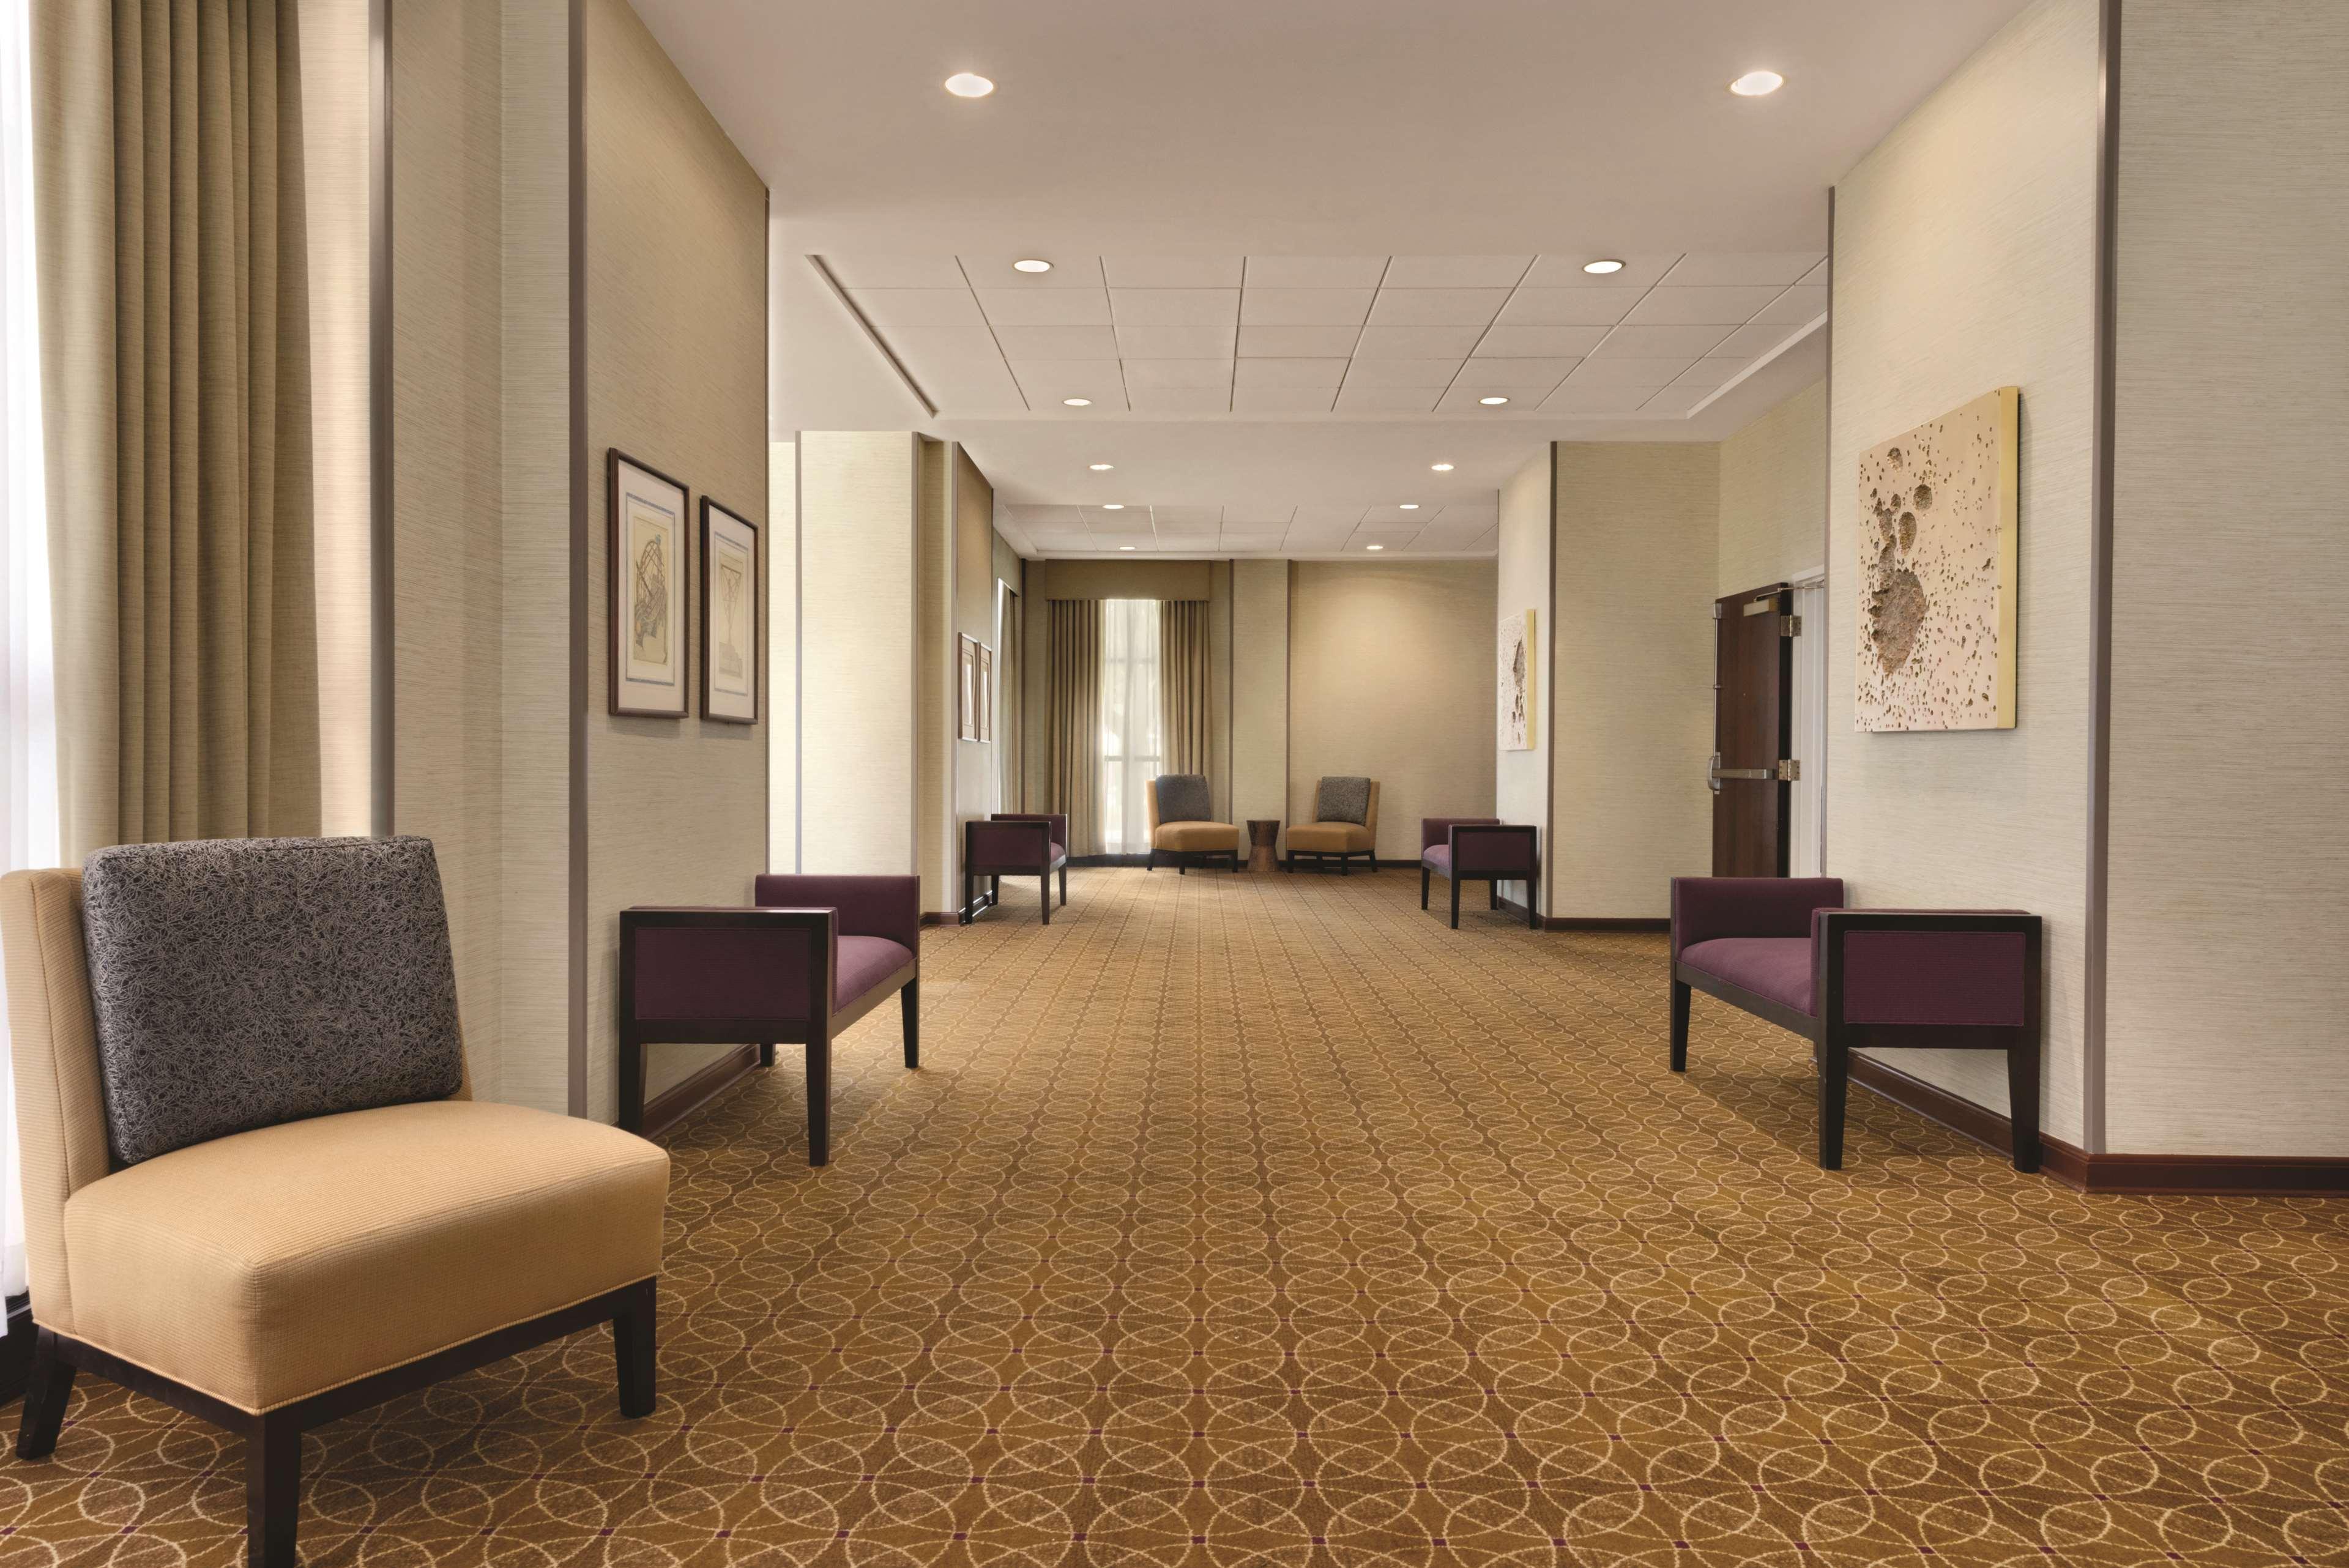 DoubleTree by Hilton Hotel Milwaukee - Brookfield image 23